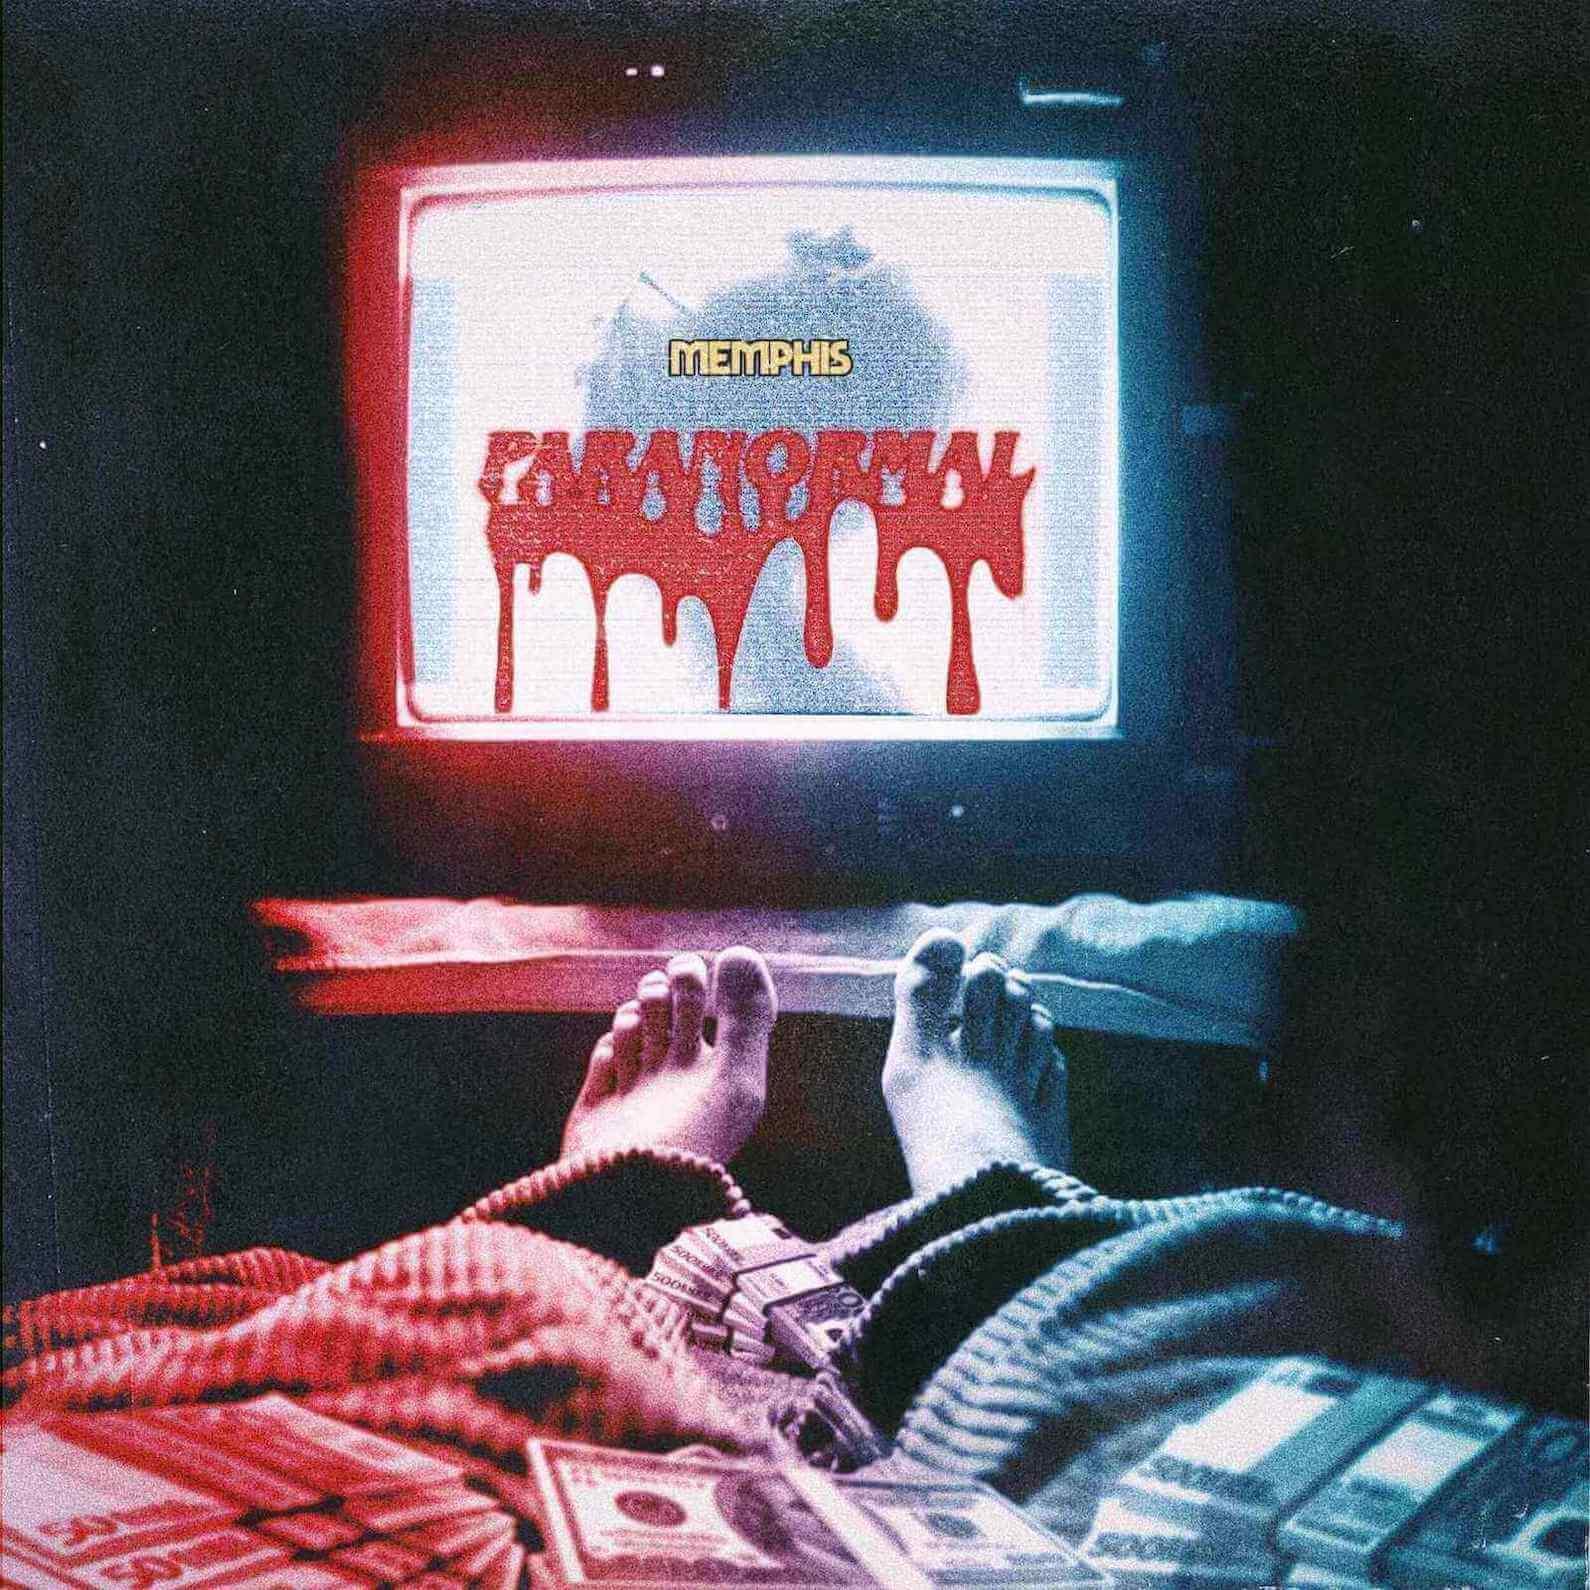 Upcoming: Memphis - Paranormal